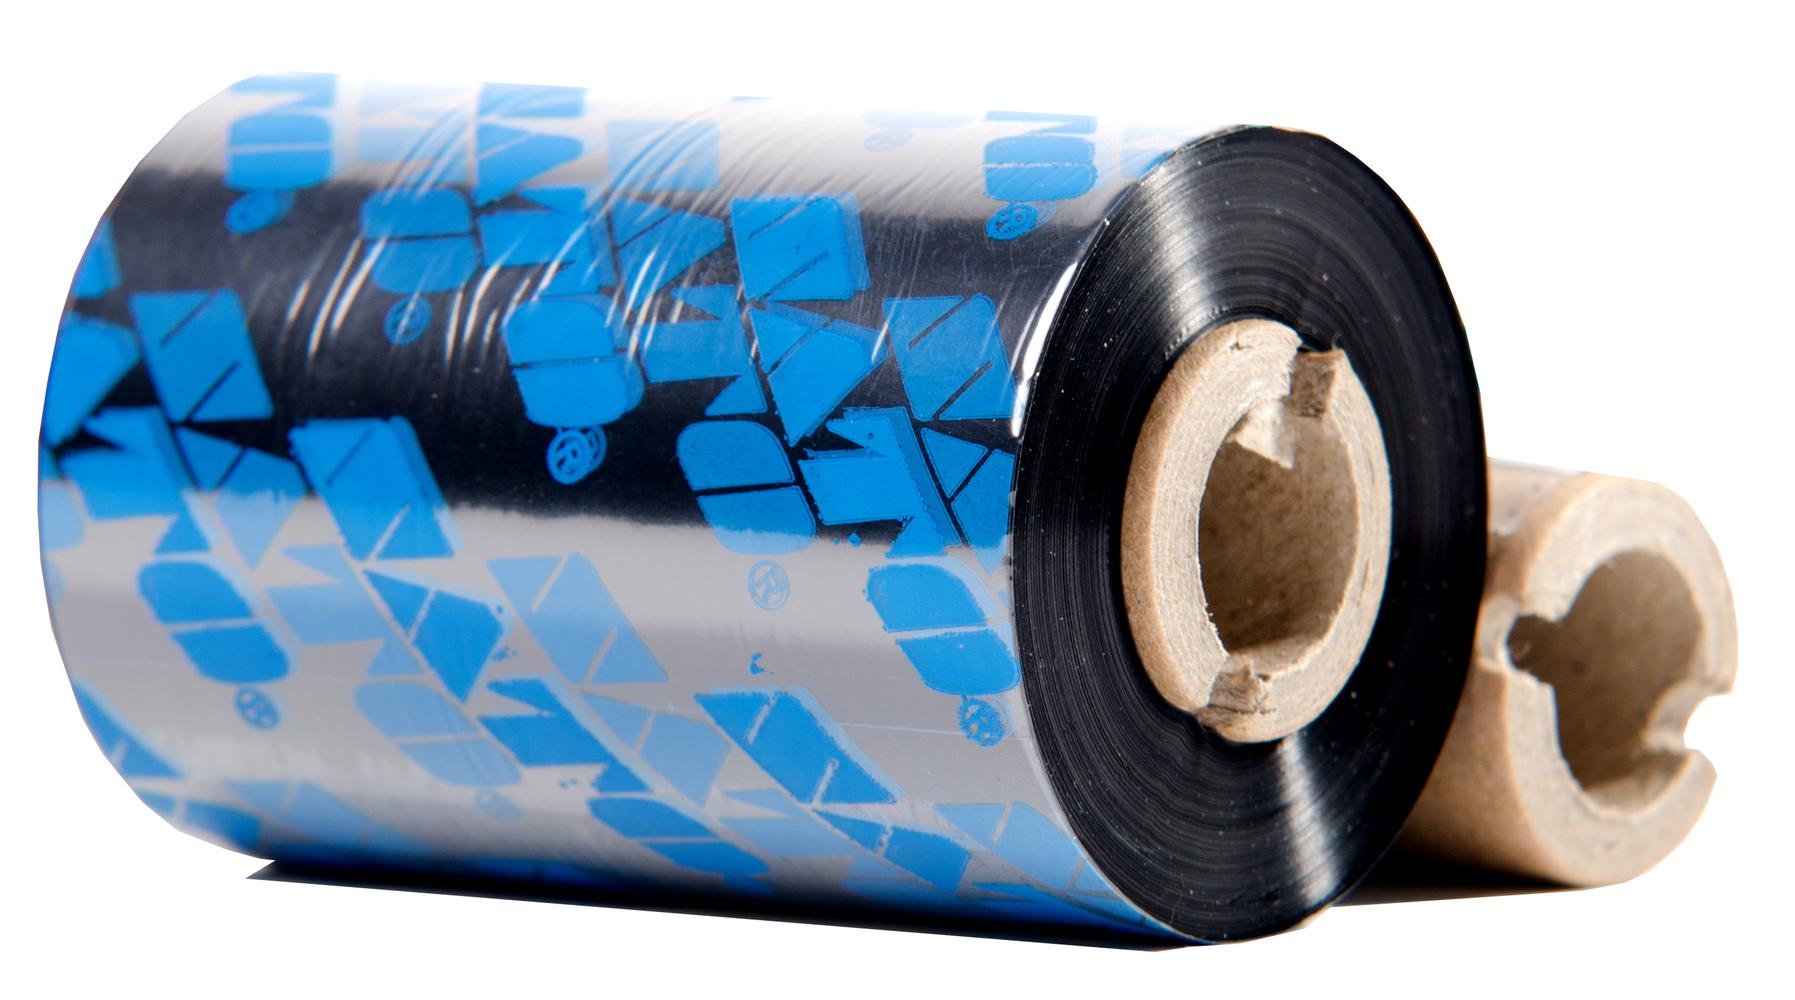 Taśma barwiąca do drukarki D-2 (SATO)